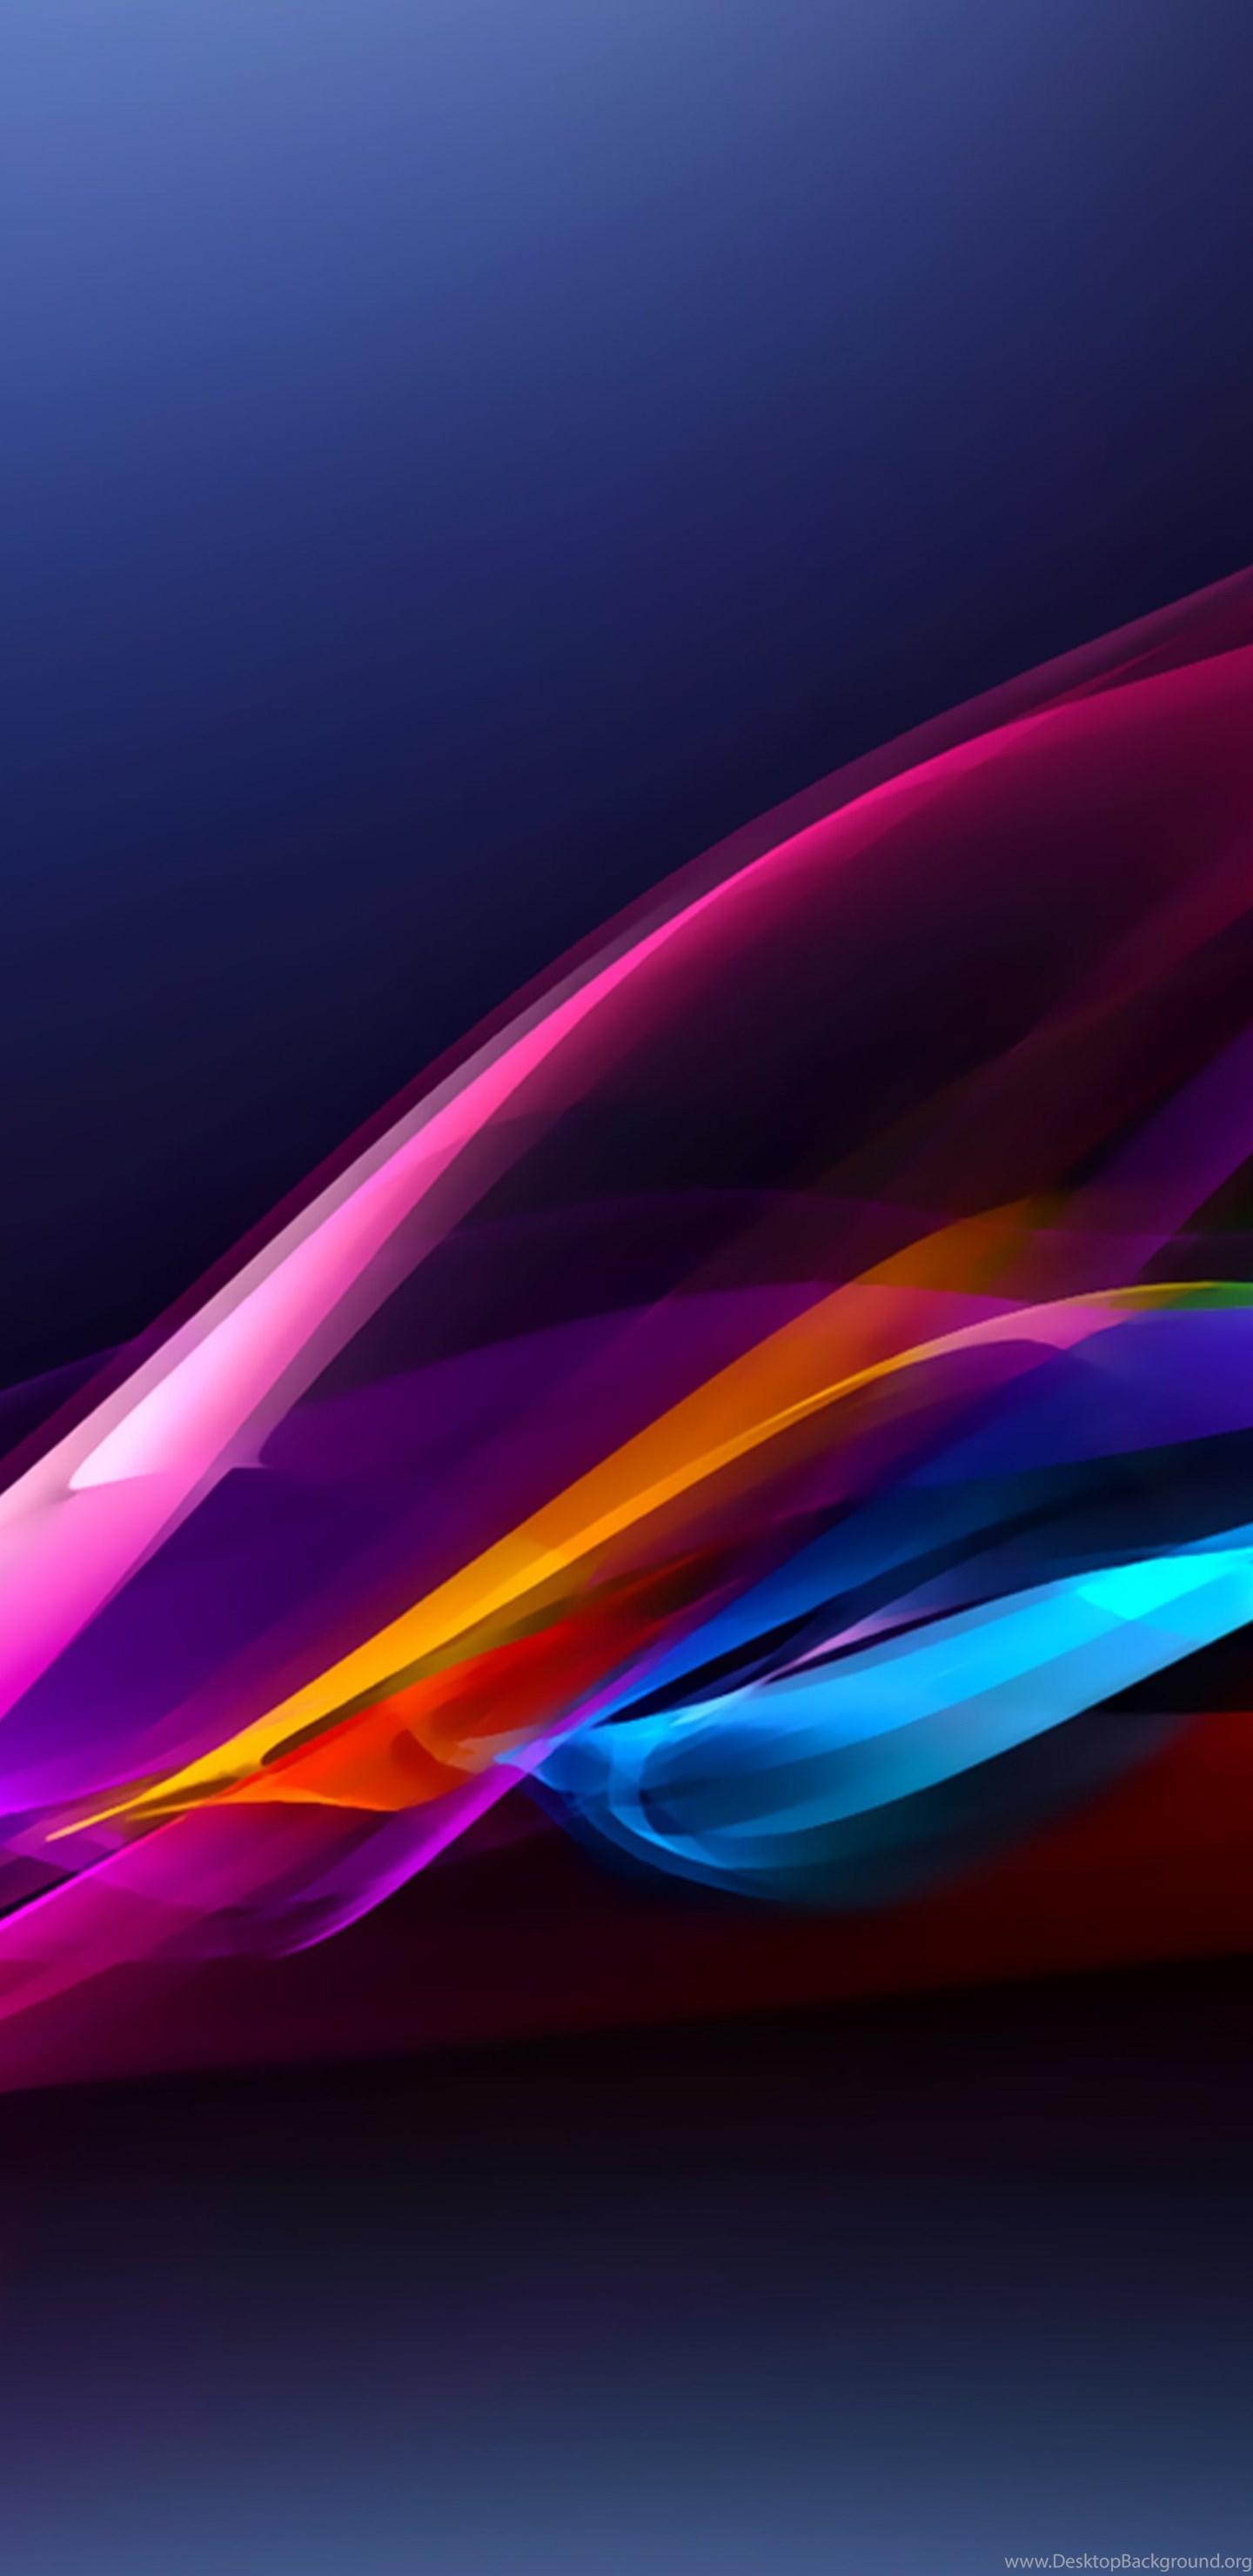 Xperia Z Ultra HD Desktop Wallpapers : Widescreen : High Definition